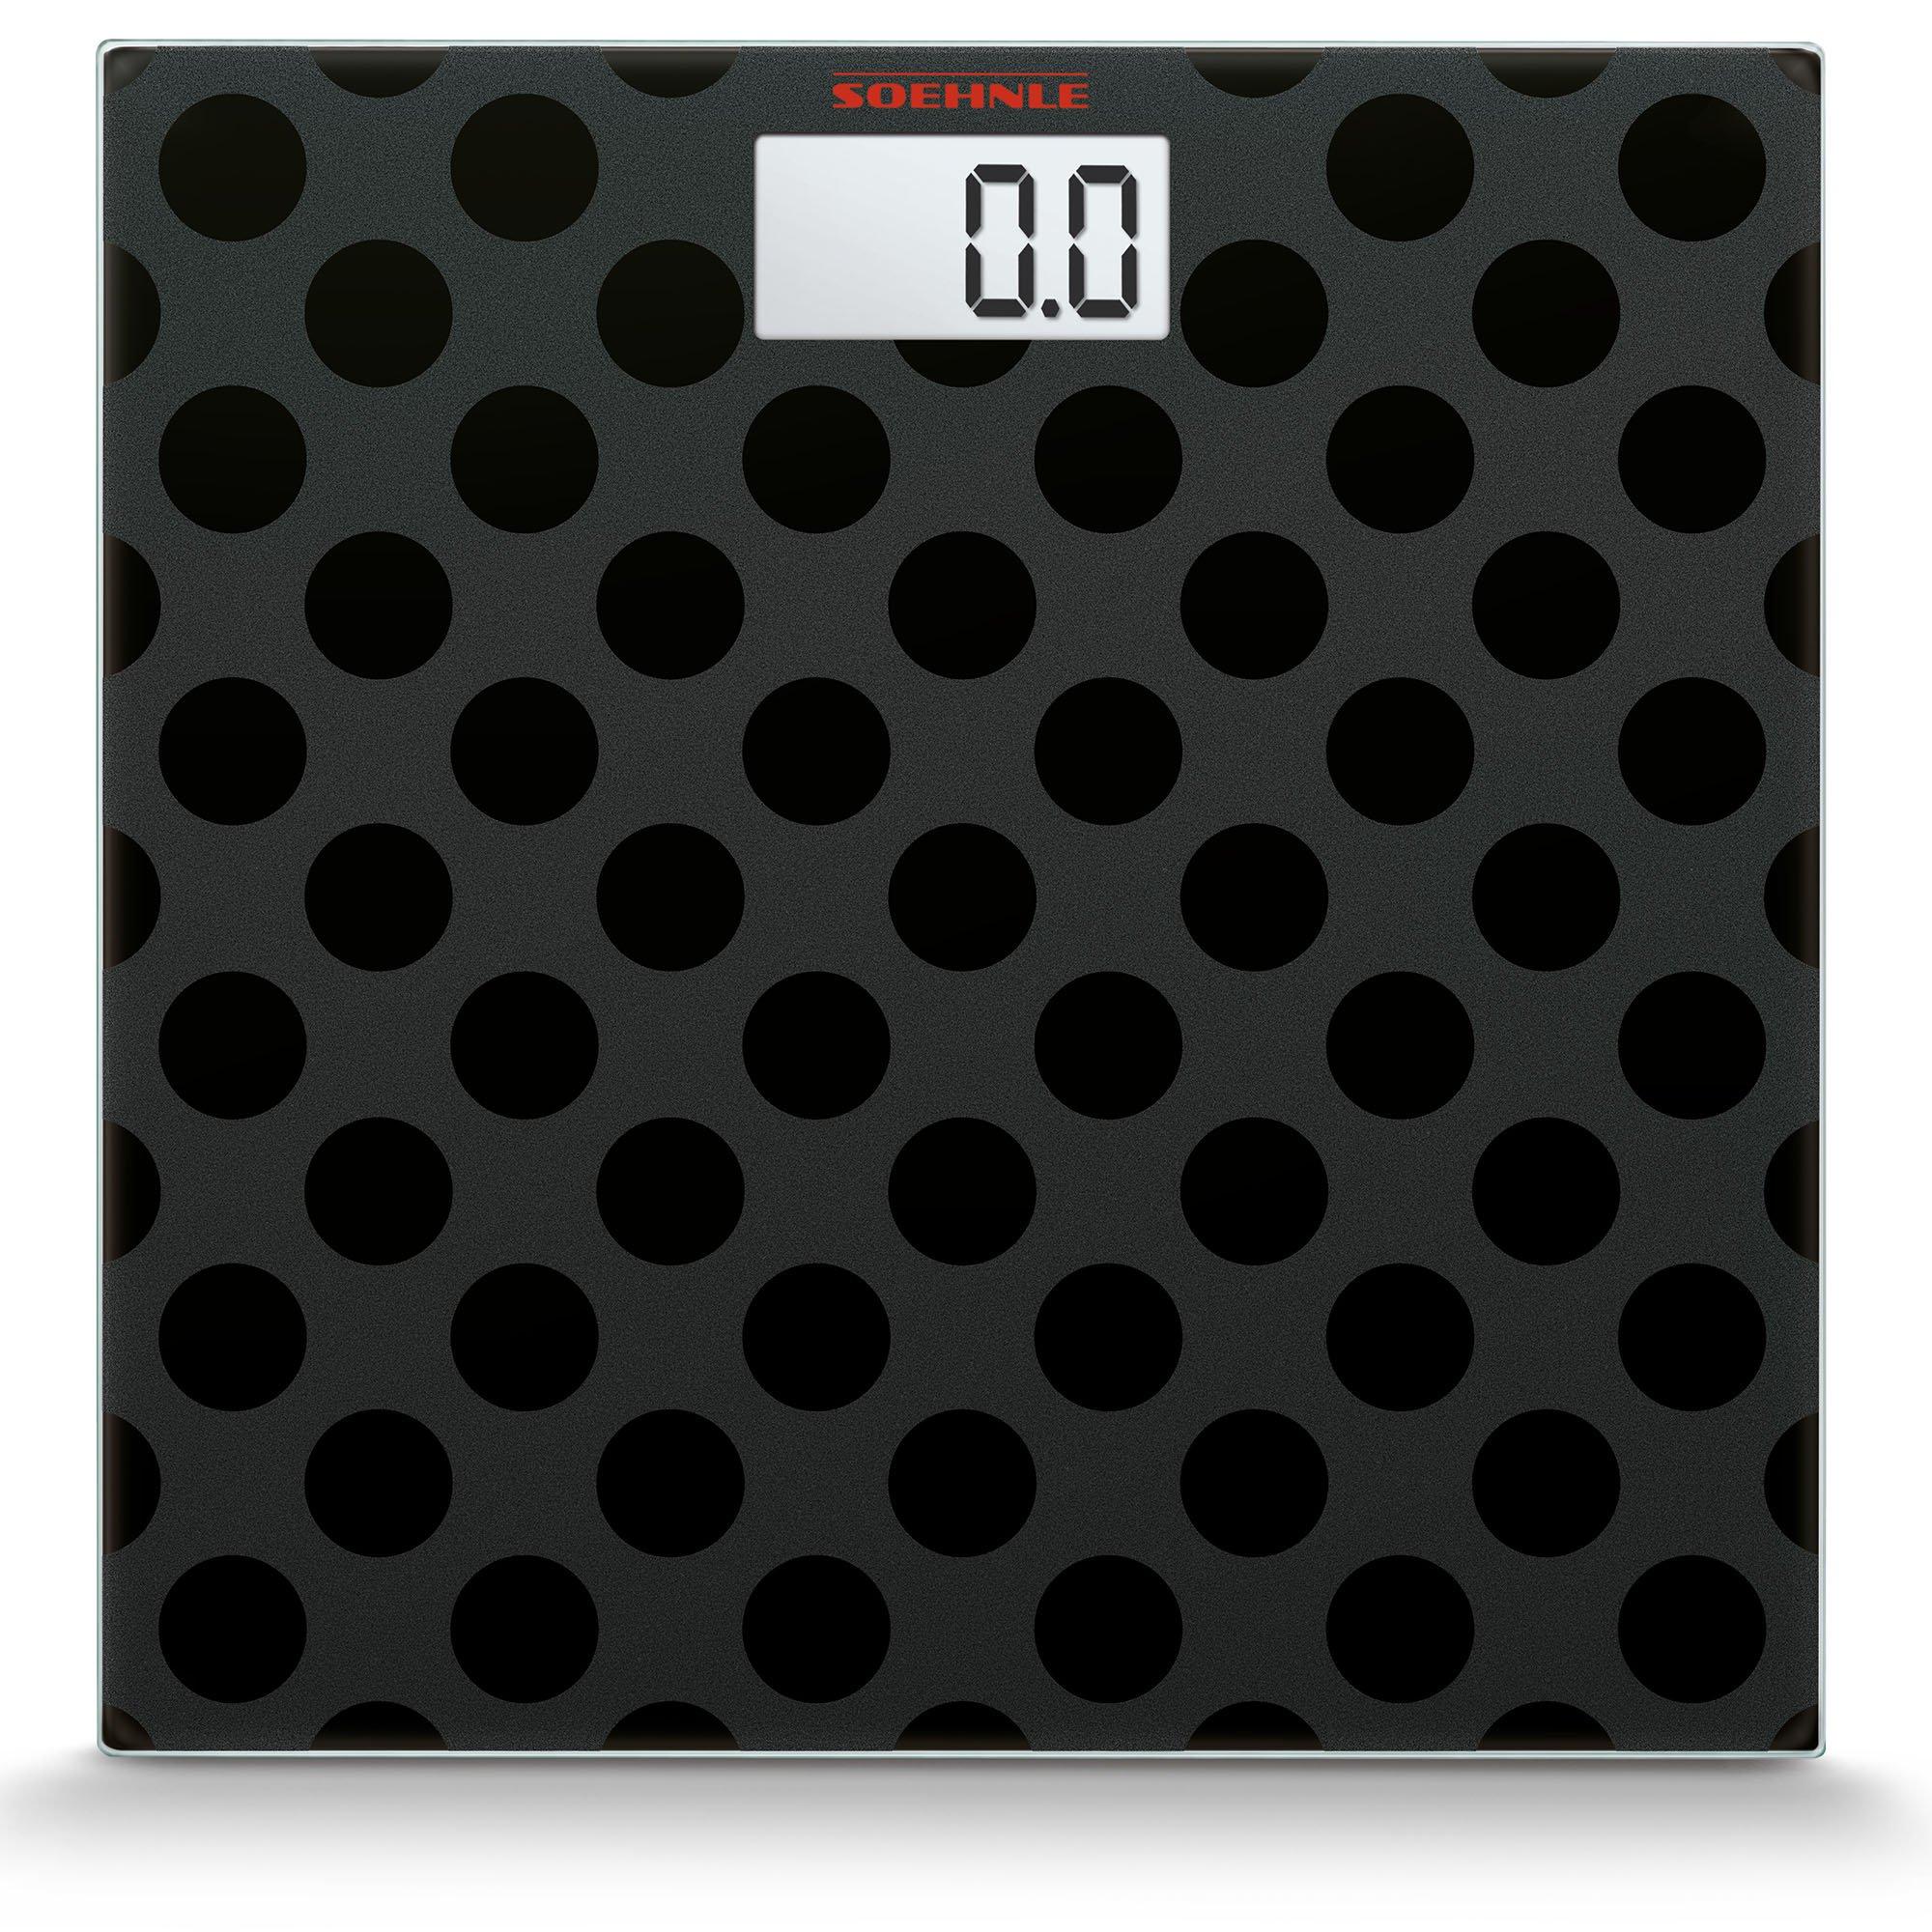 Soehnle Maya Digital black Edition Personal Glass Bathroom Scale, Circles by Soehnle (Image #2)